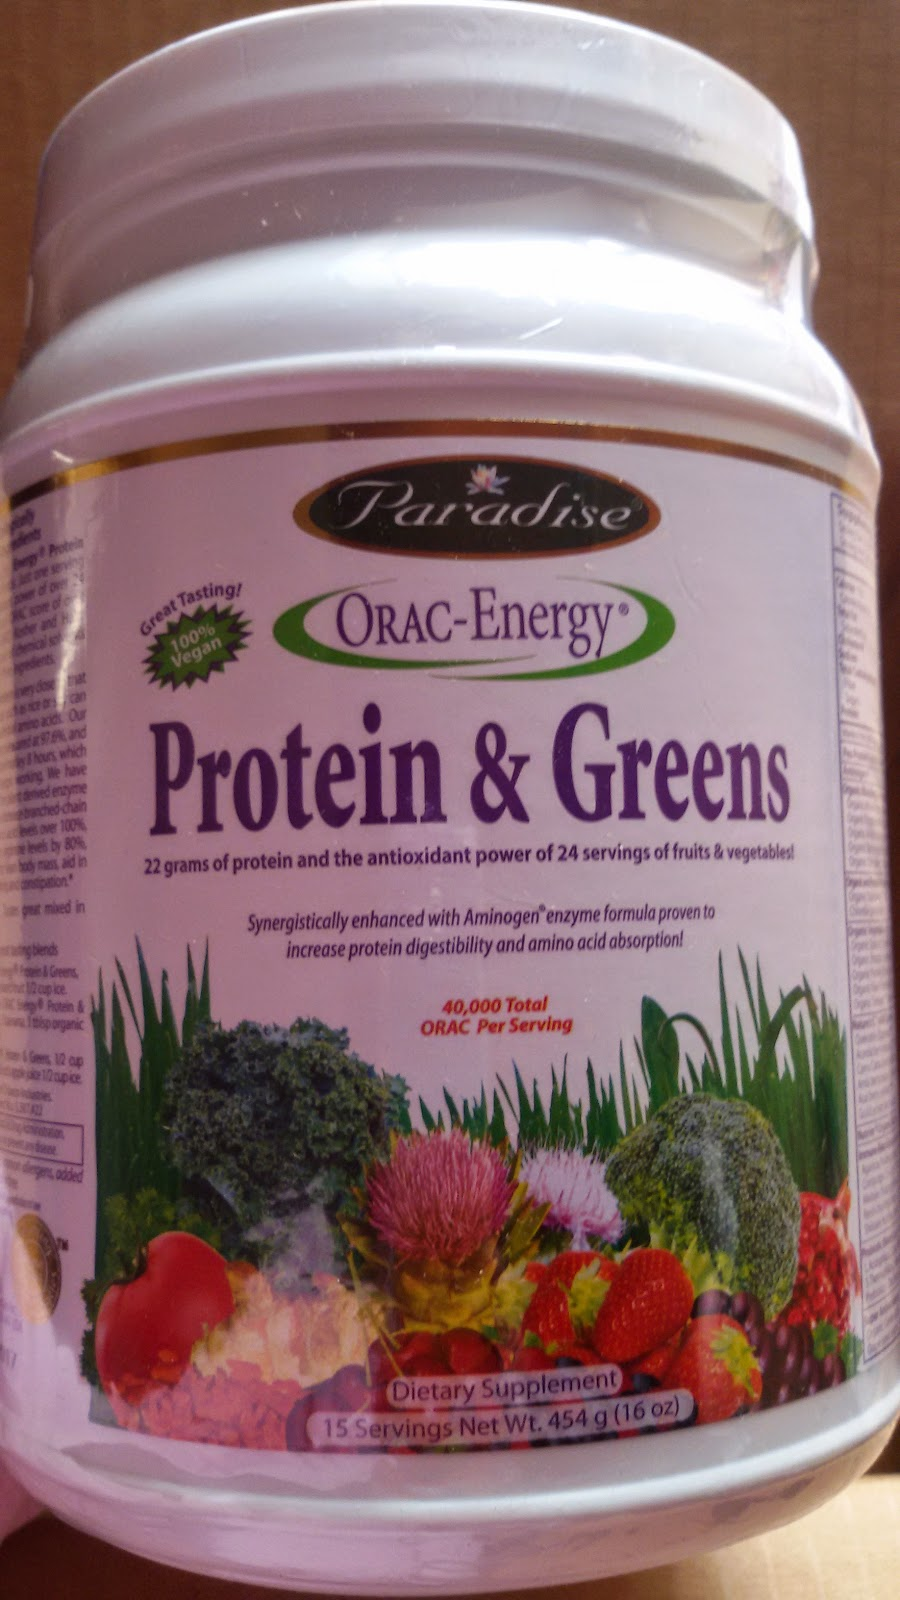 Paradise Orac-Energy Protein & Greens